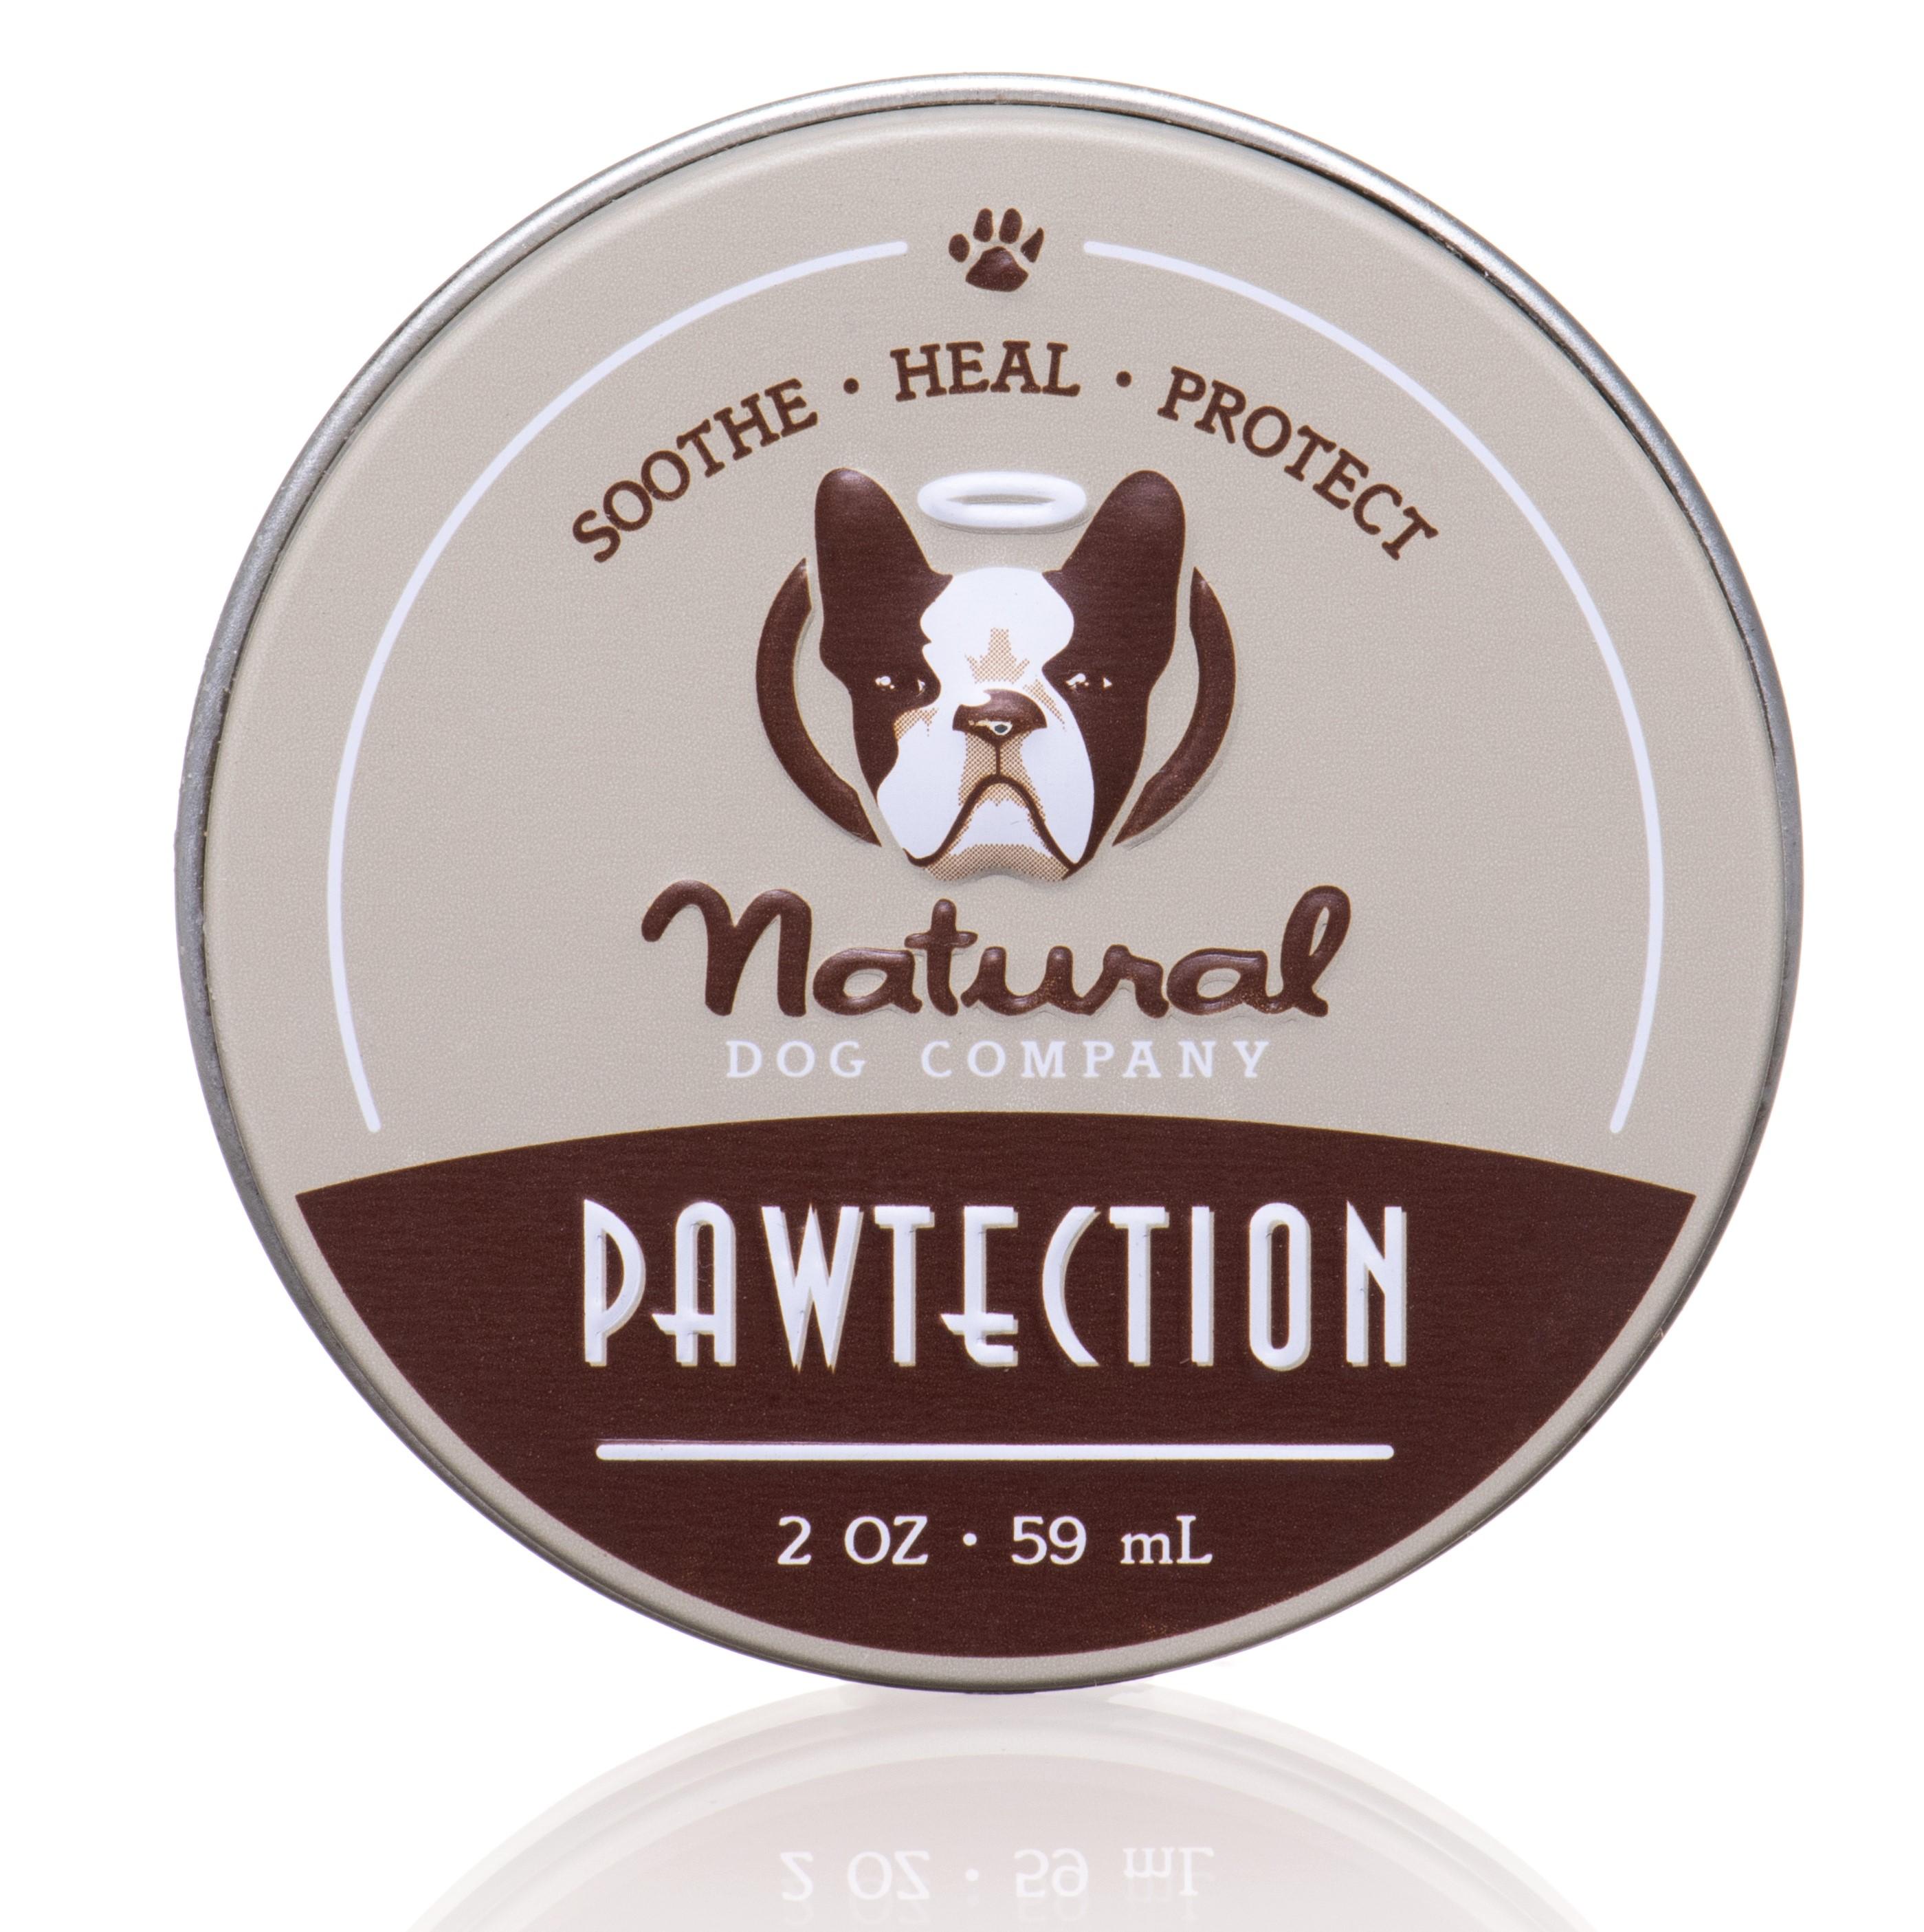 Natural Dog Company Paw tection - Ochranný vosk na tlapky Ochraný vosk na tlapky 59 ml